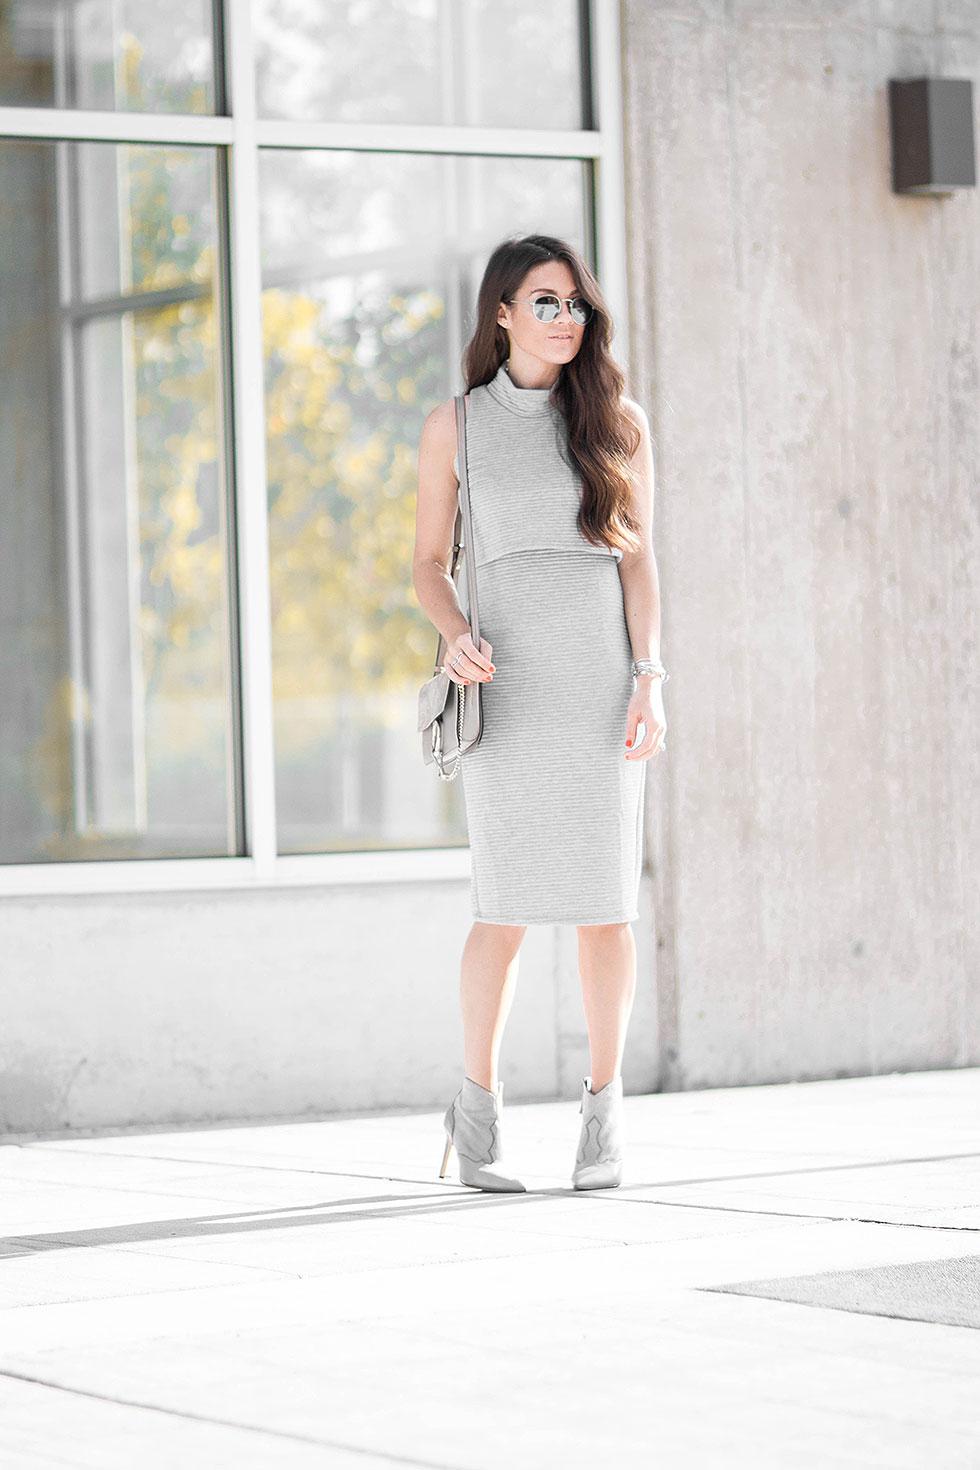 Monochormatic Grey Outfit Mock-Turtleneck Popover Dress